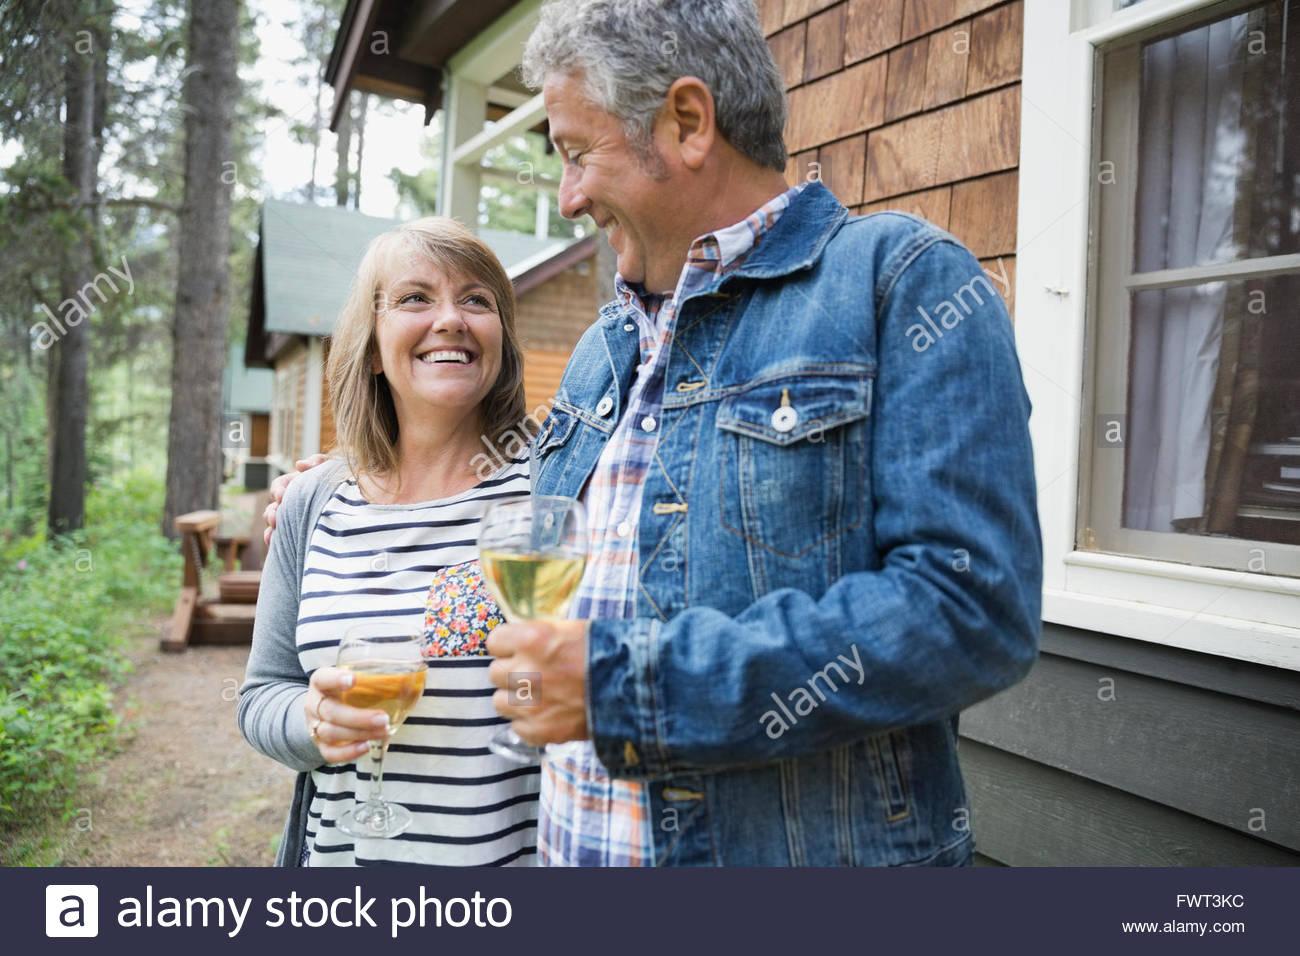 Happy couple drinking wine outdoors - Stock Image